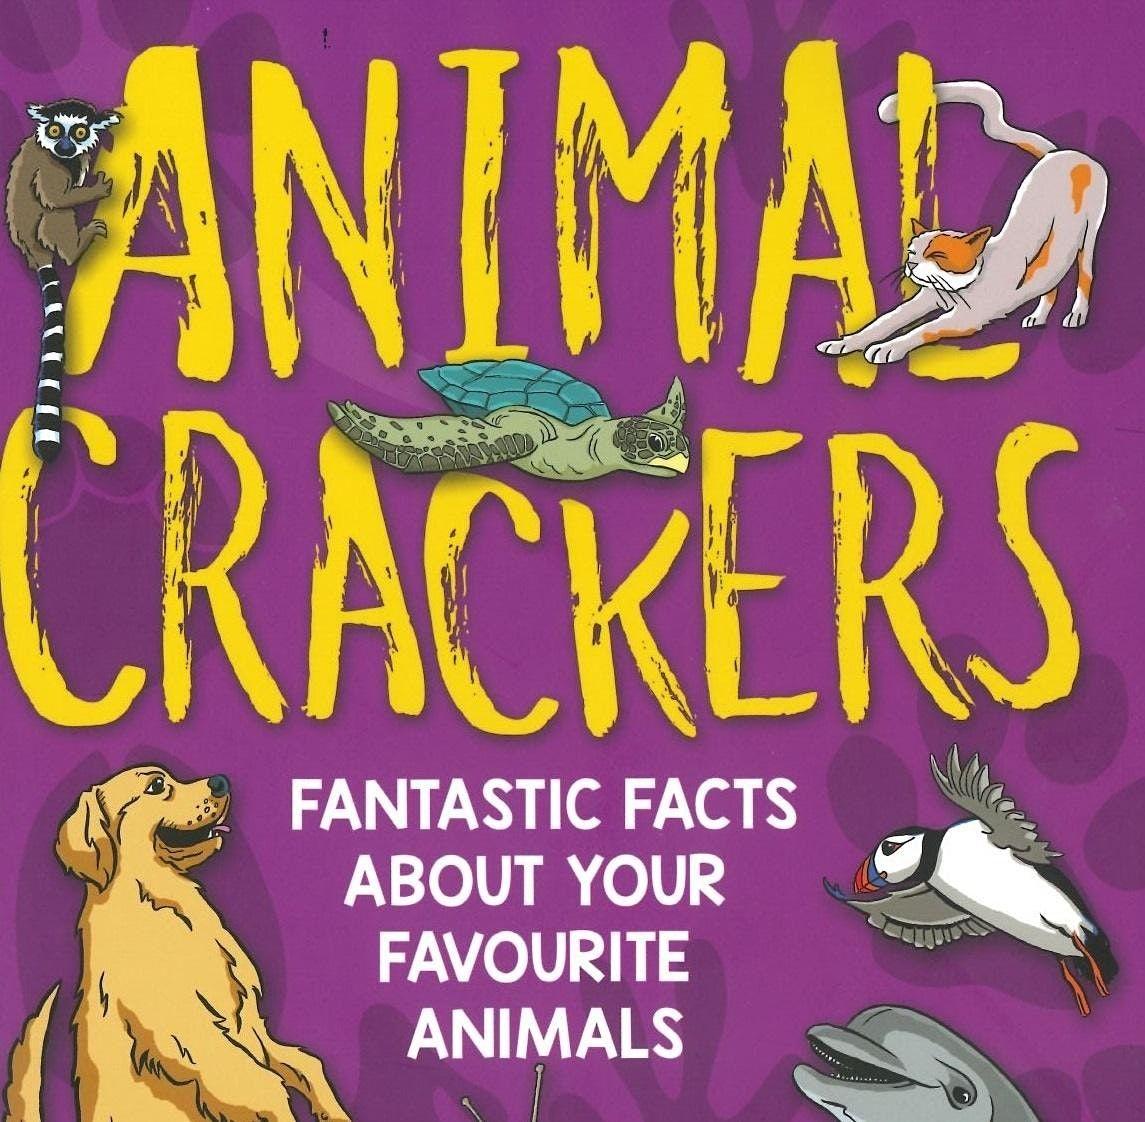 The Animal Crackers Family Challenge with Alan Nolan and Sarah Webb